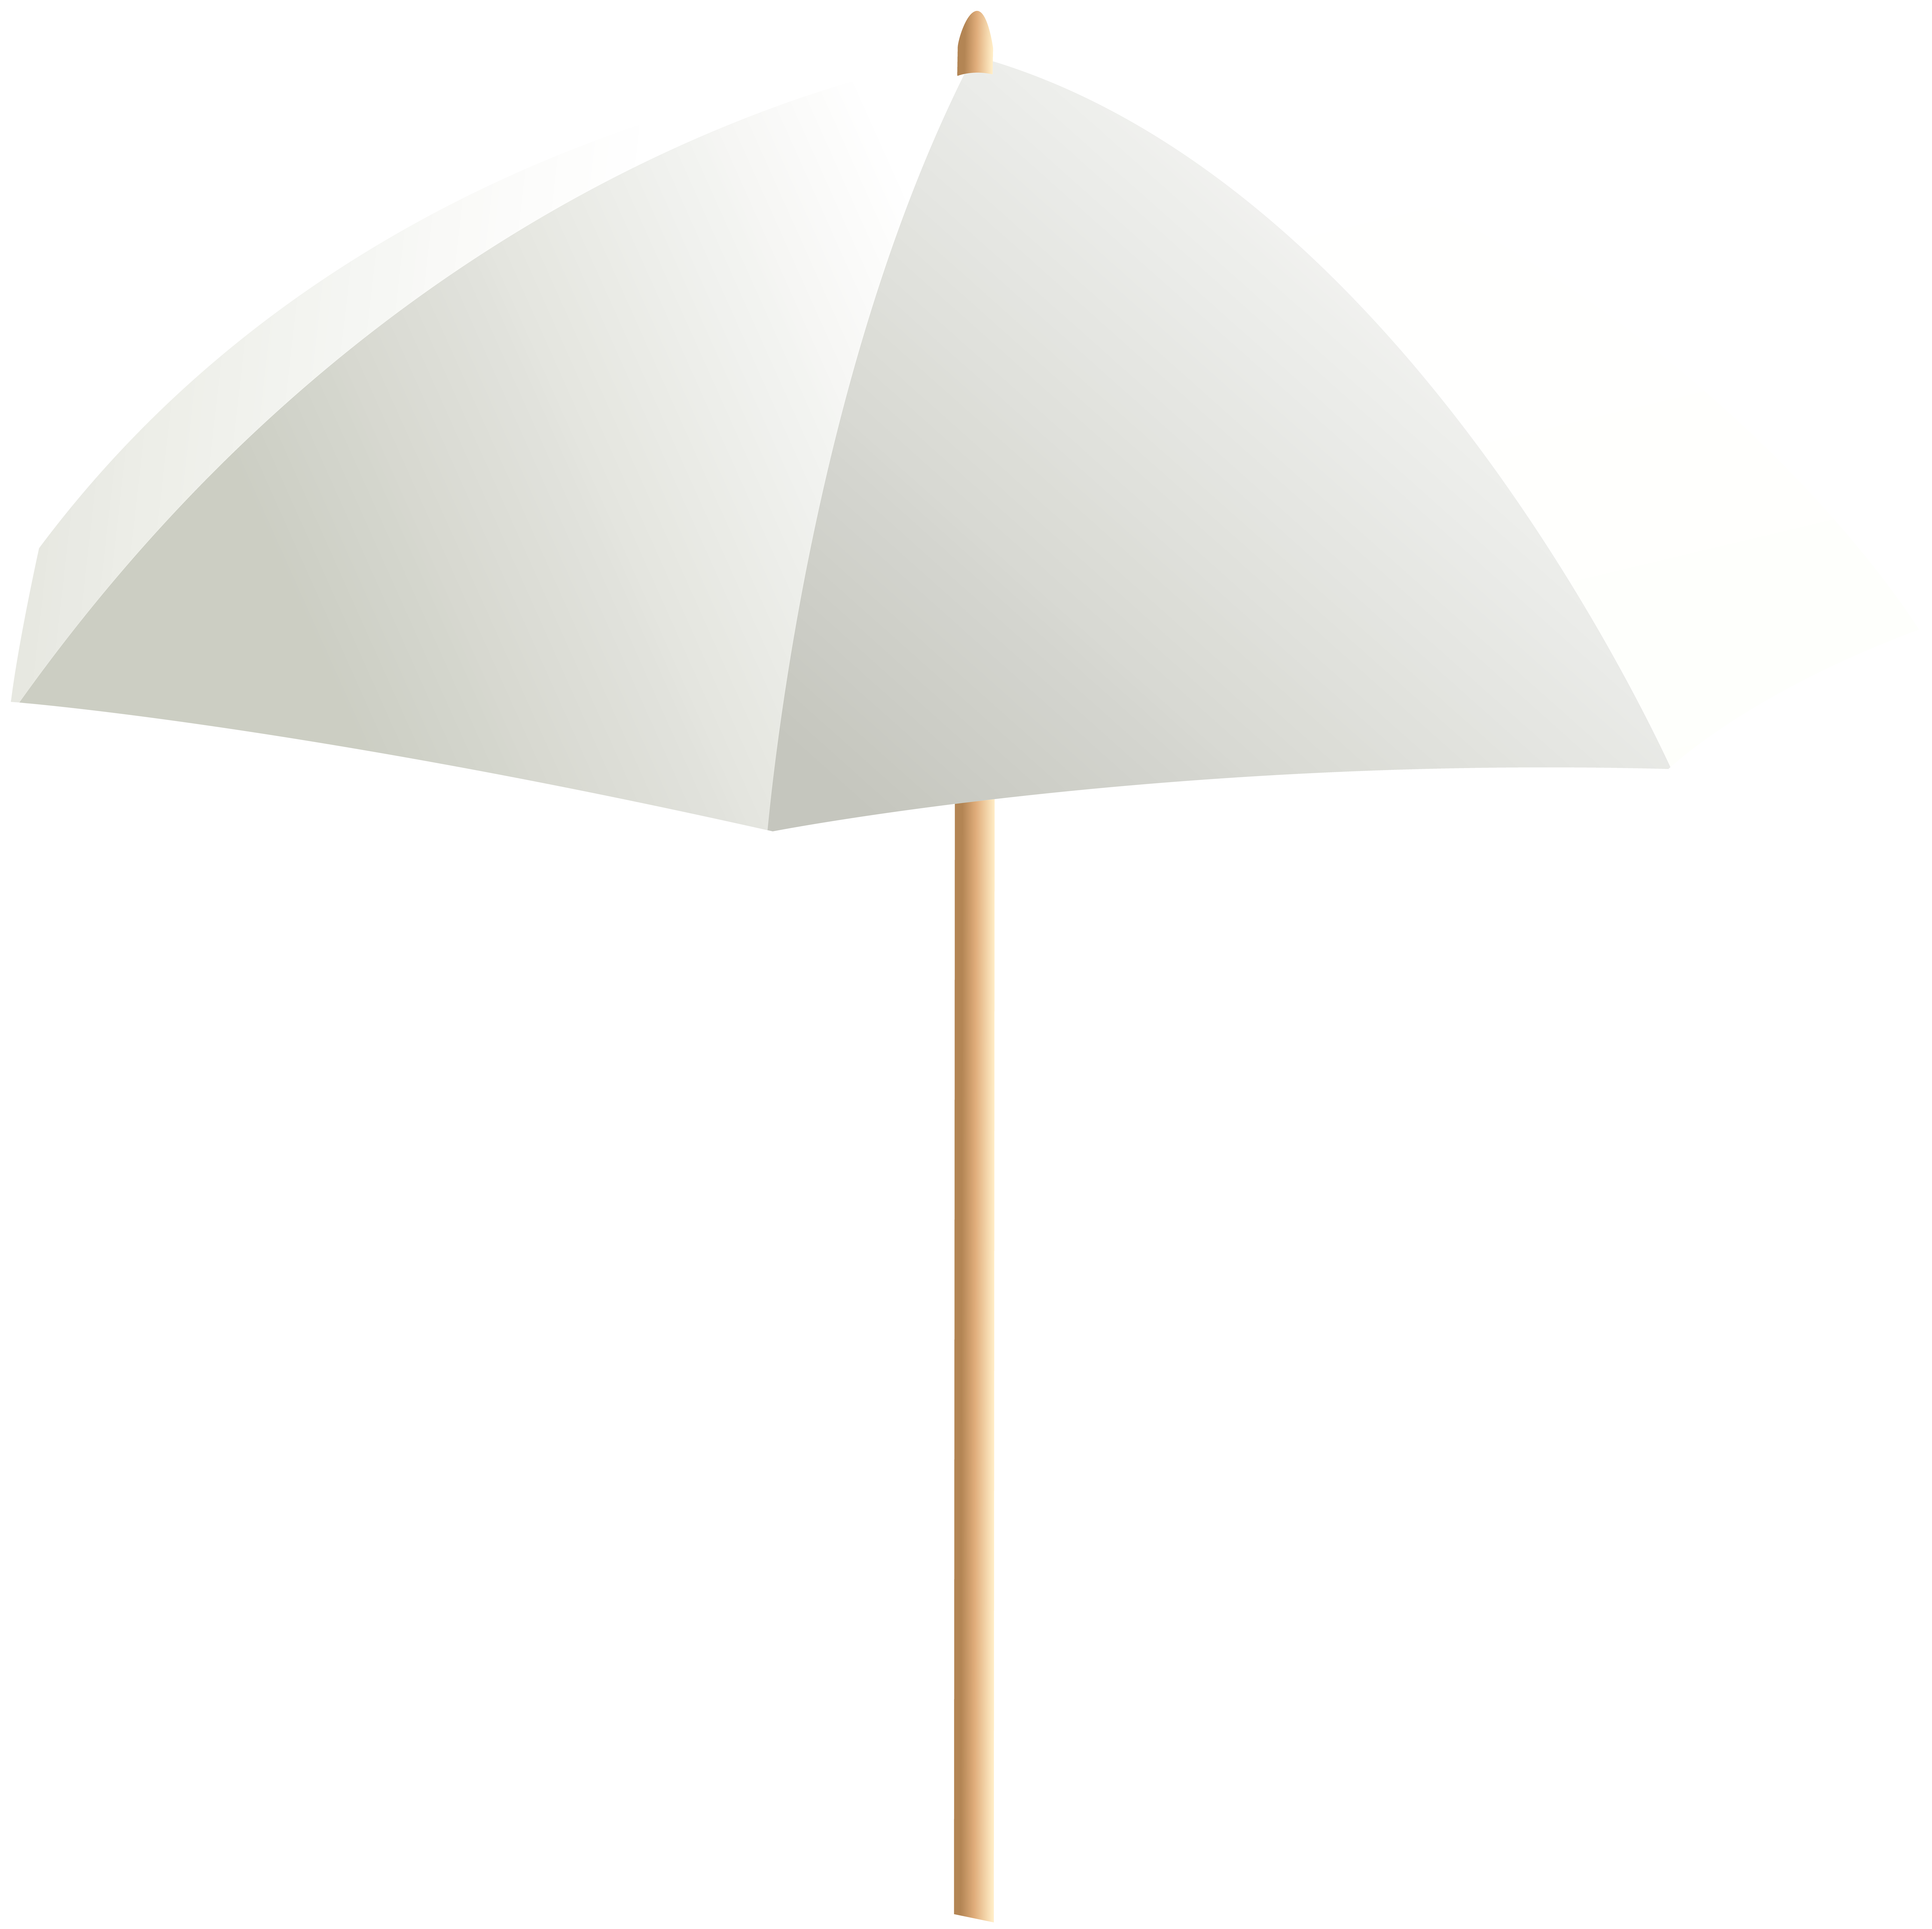 Clipart umbrella summer hat. Beach white png clip